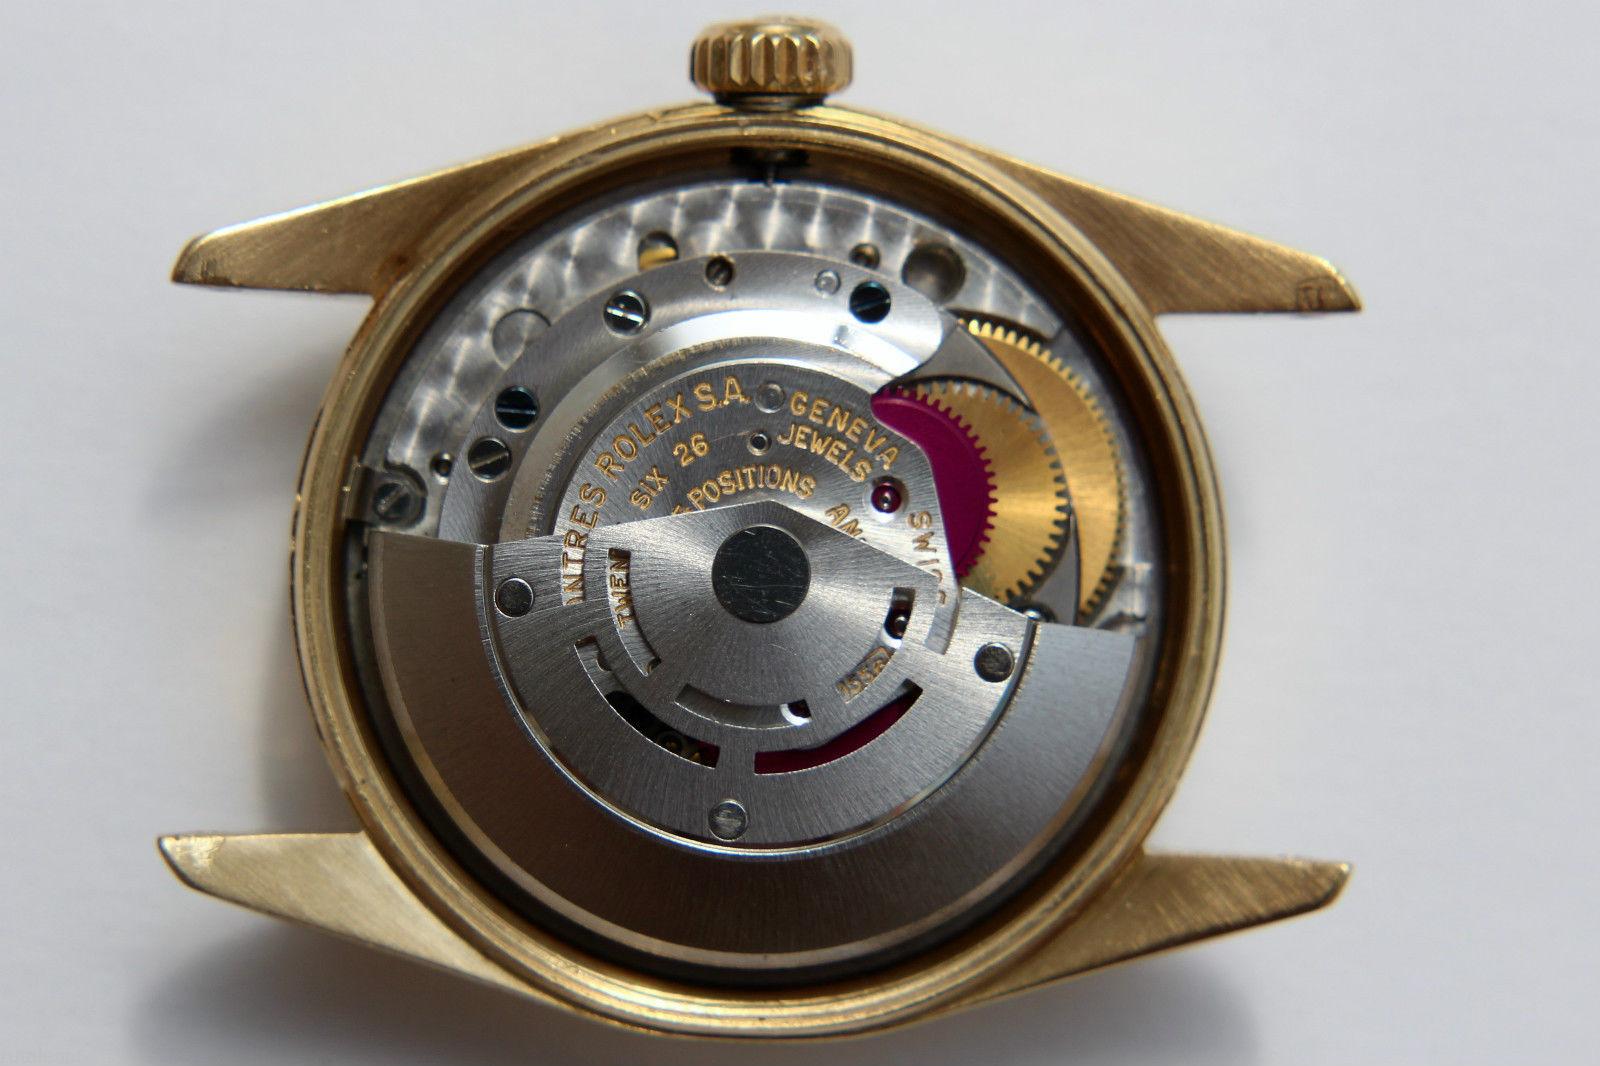 Watch Movement - Automatic - Rolex 1556